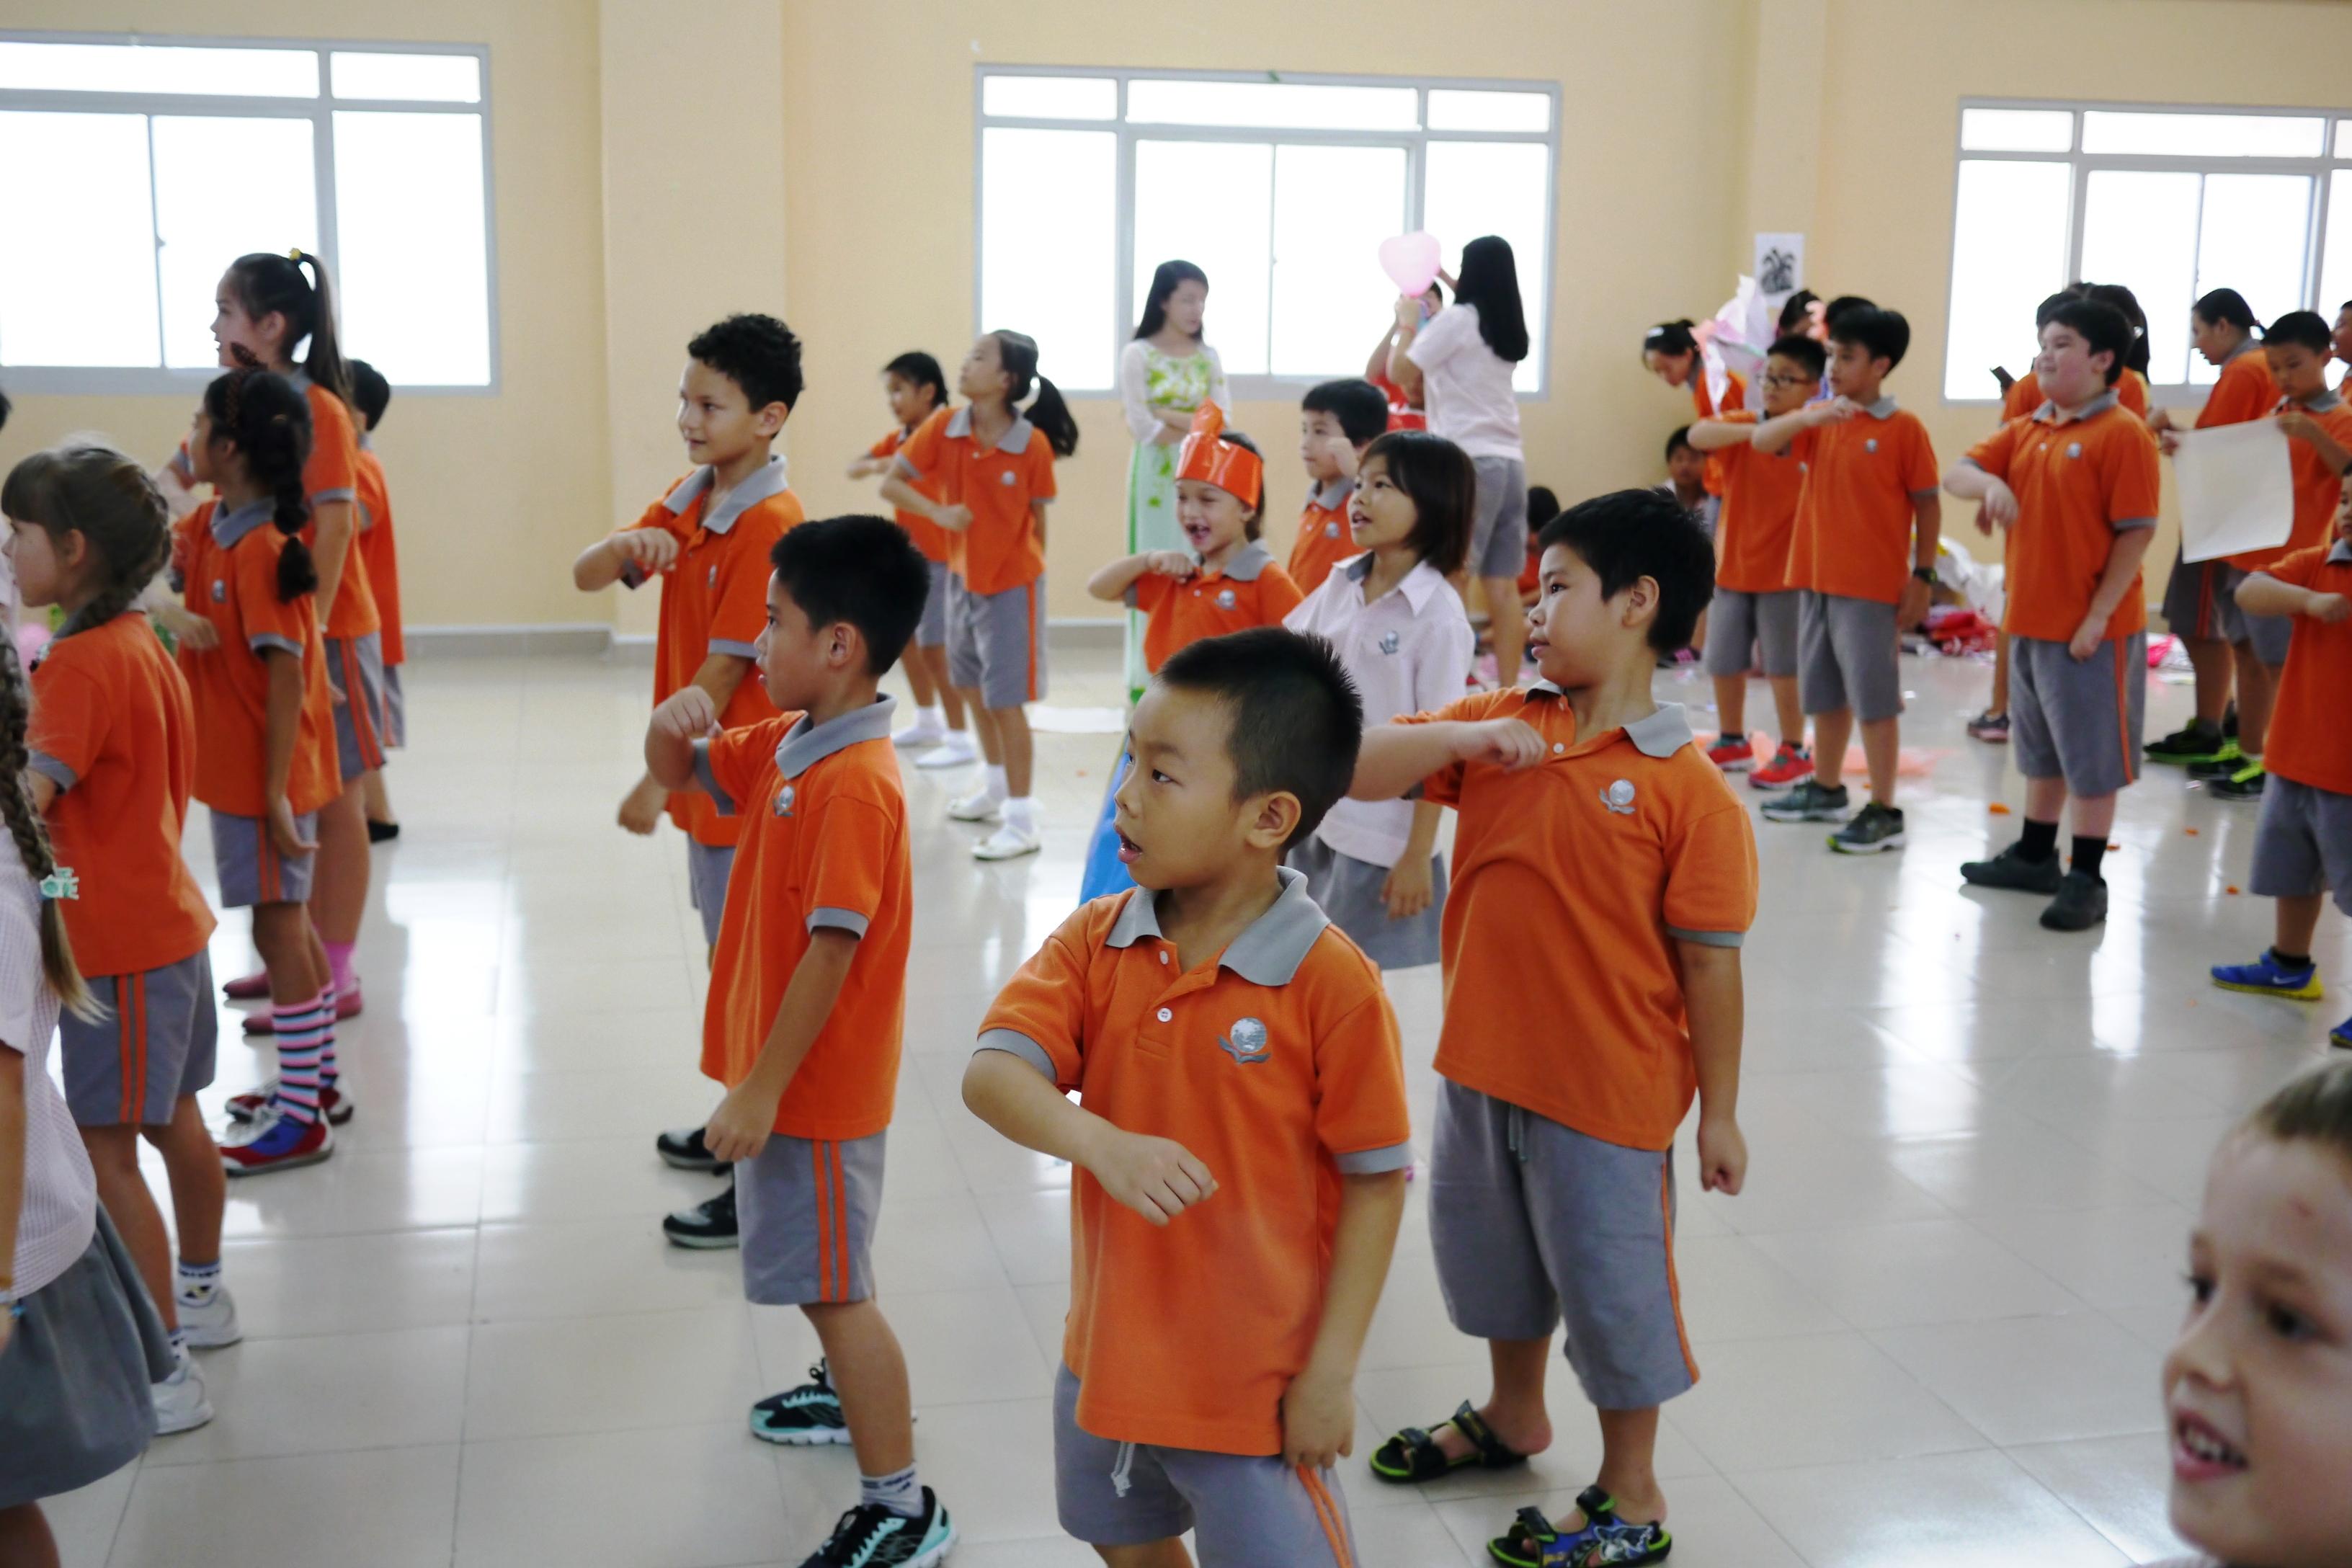 Teachers' Day Activities - Singapore International School